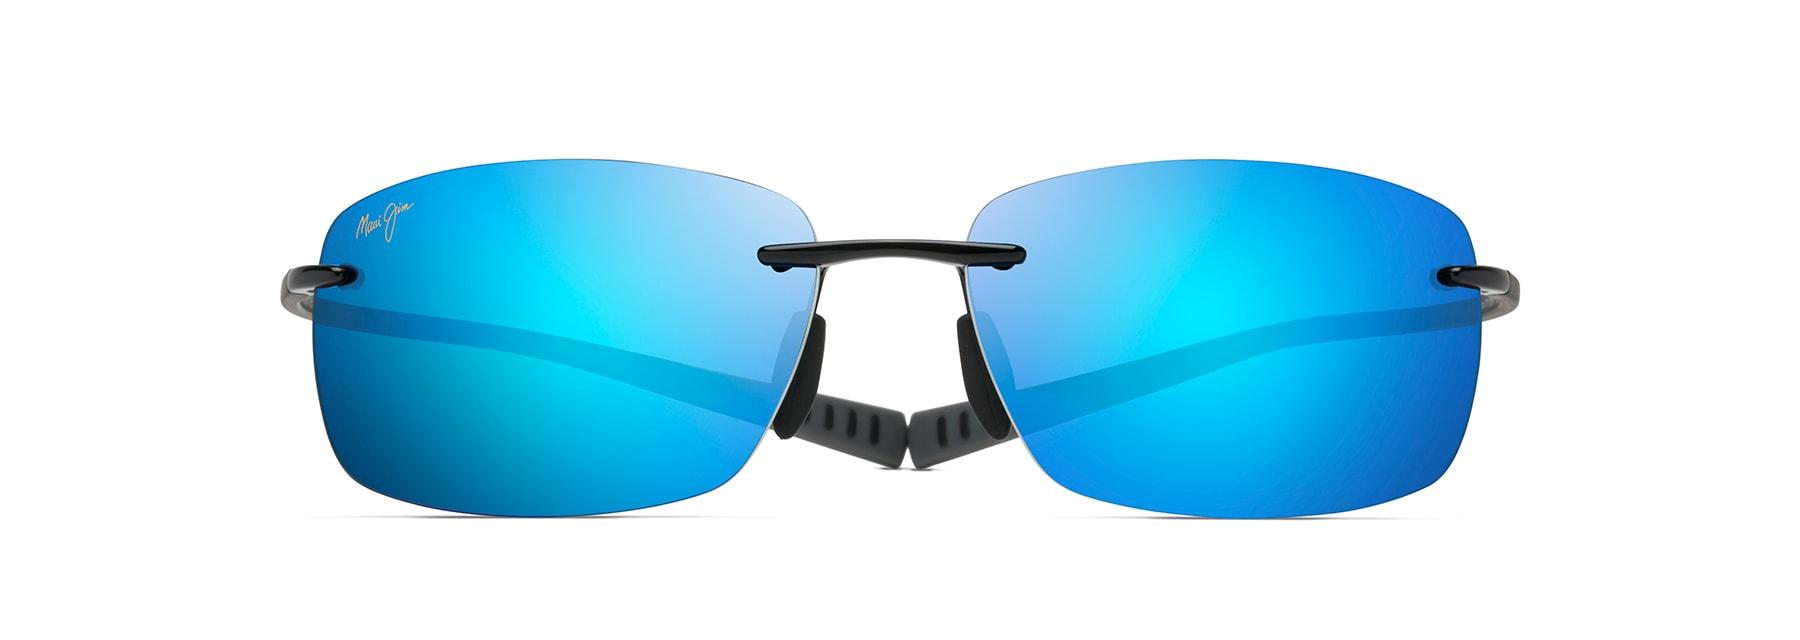 23693ac4508 Kumu Polarized Sunglasses